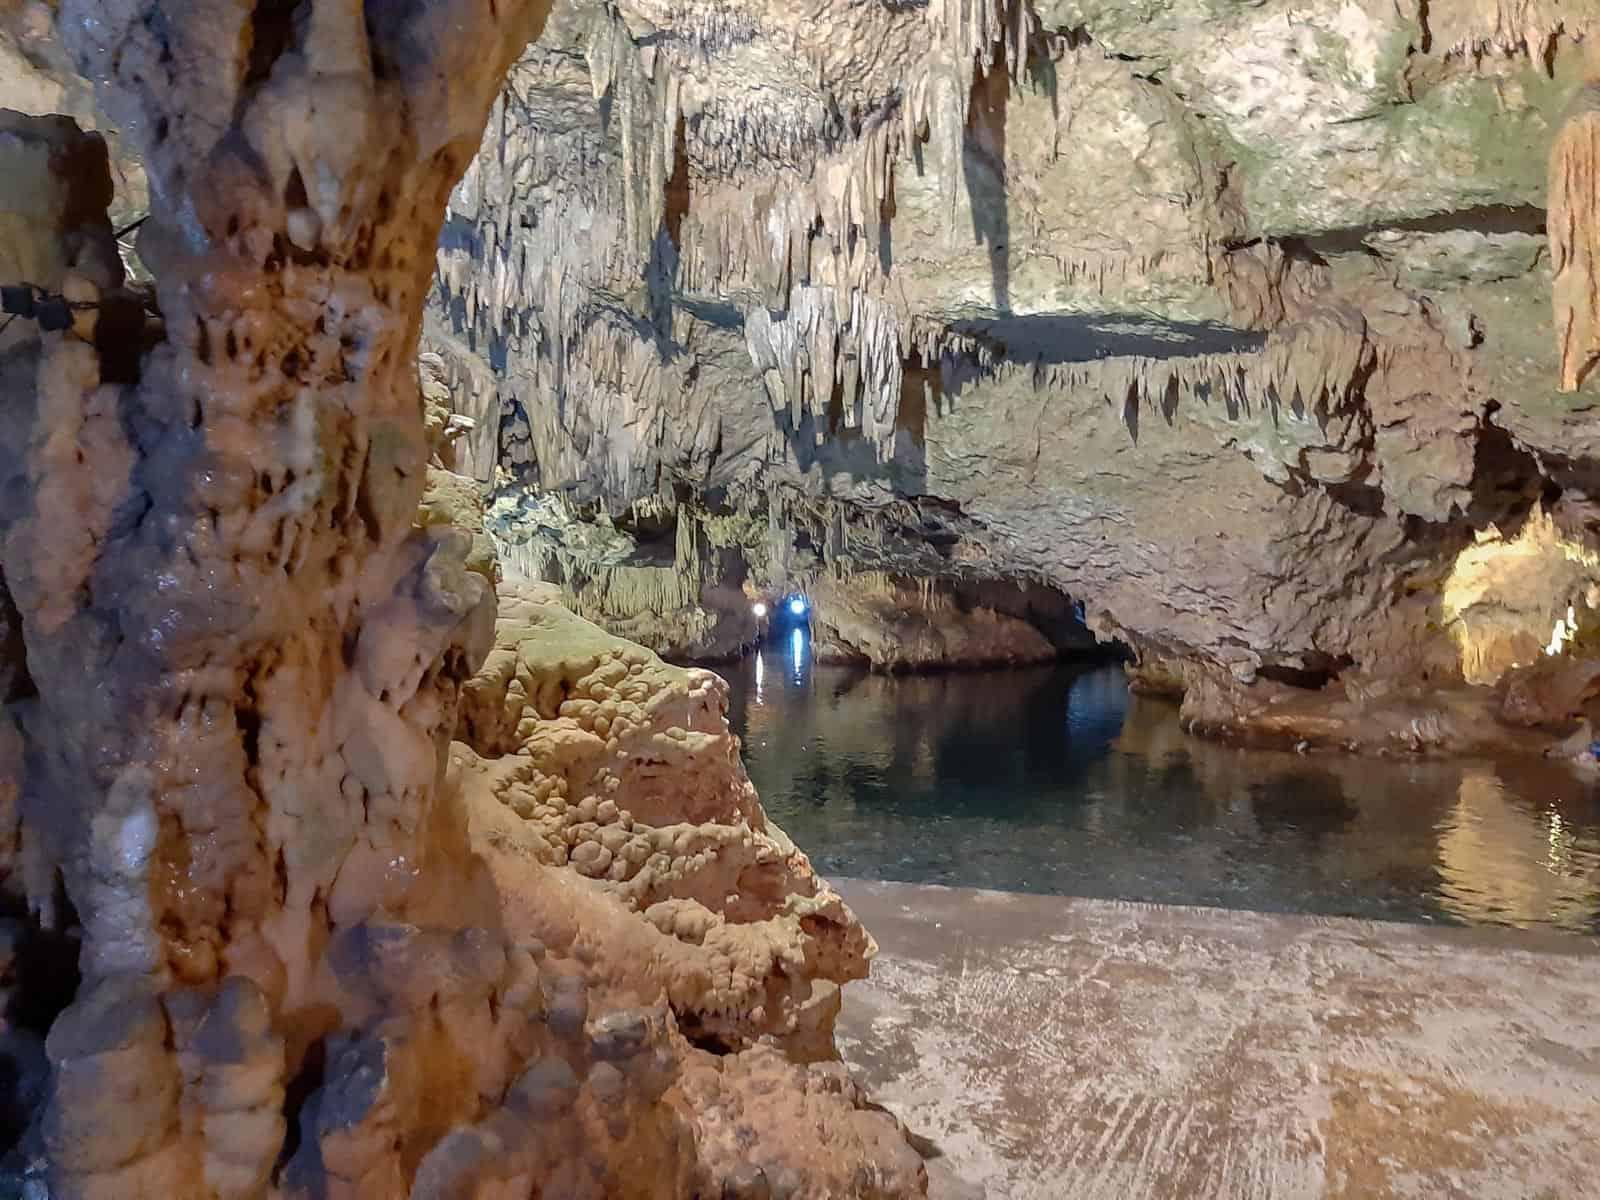 Diros grotte